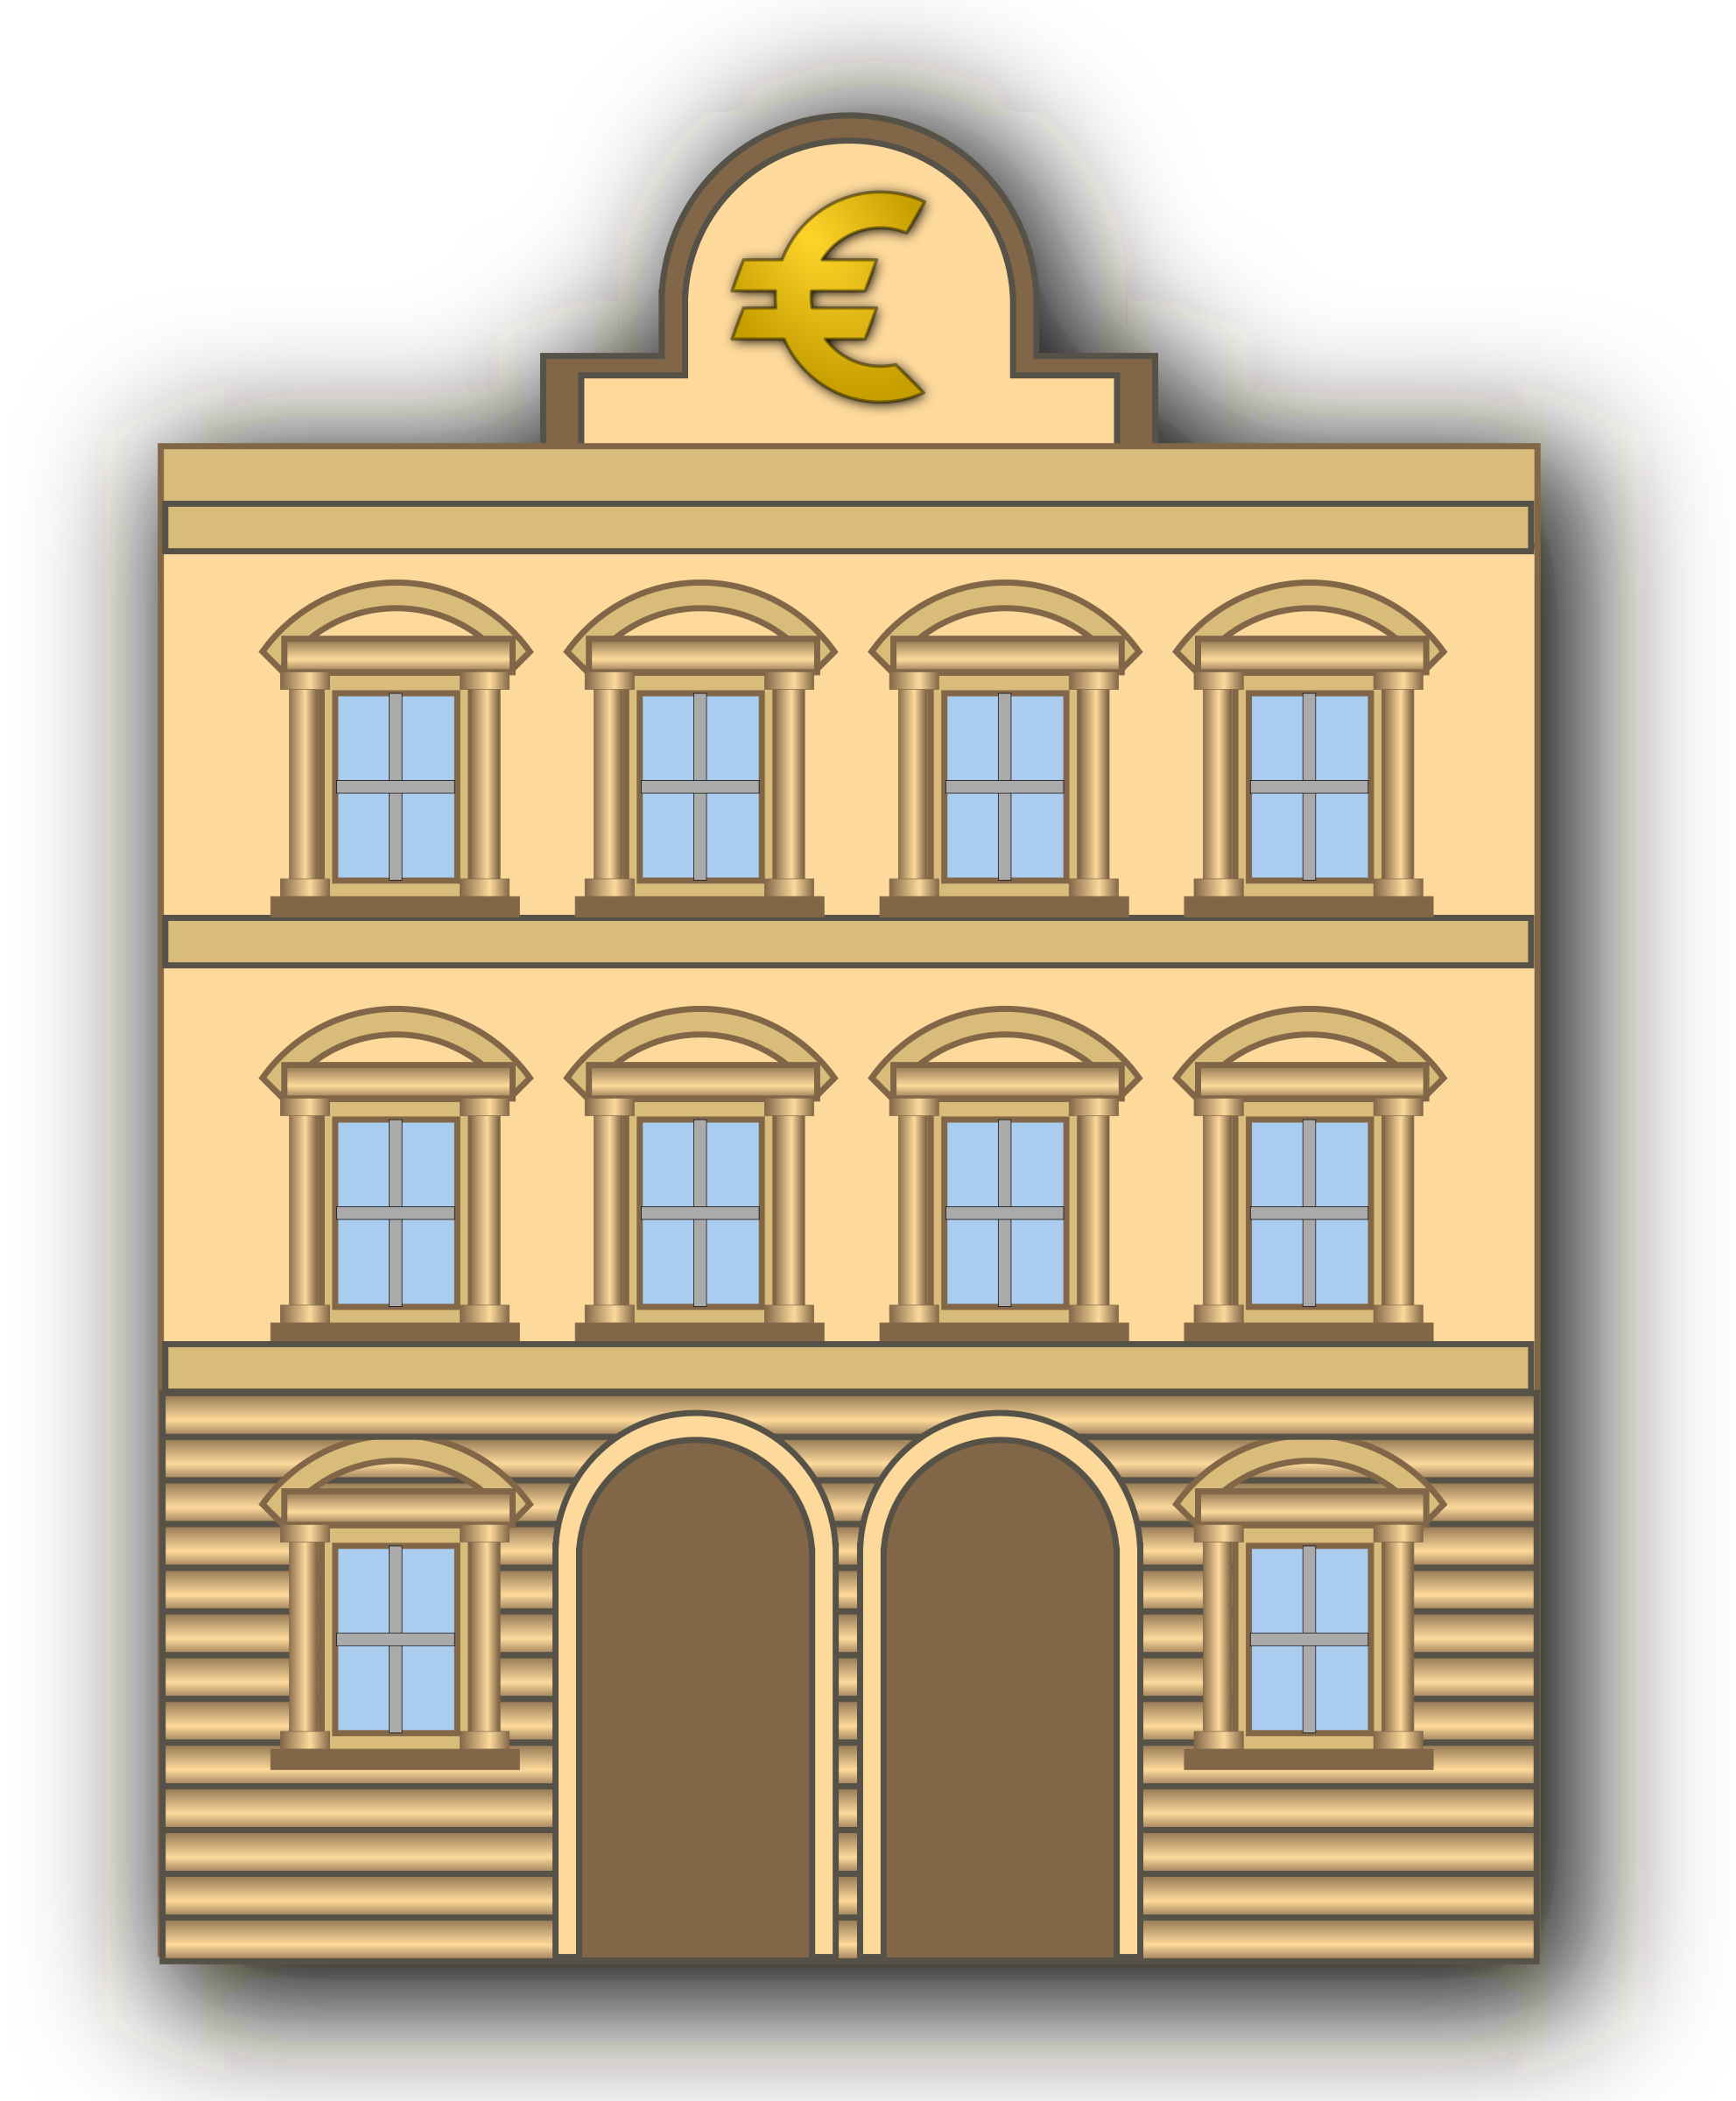 Bank clip art 3 image